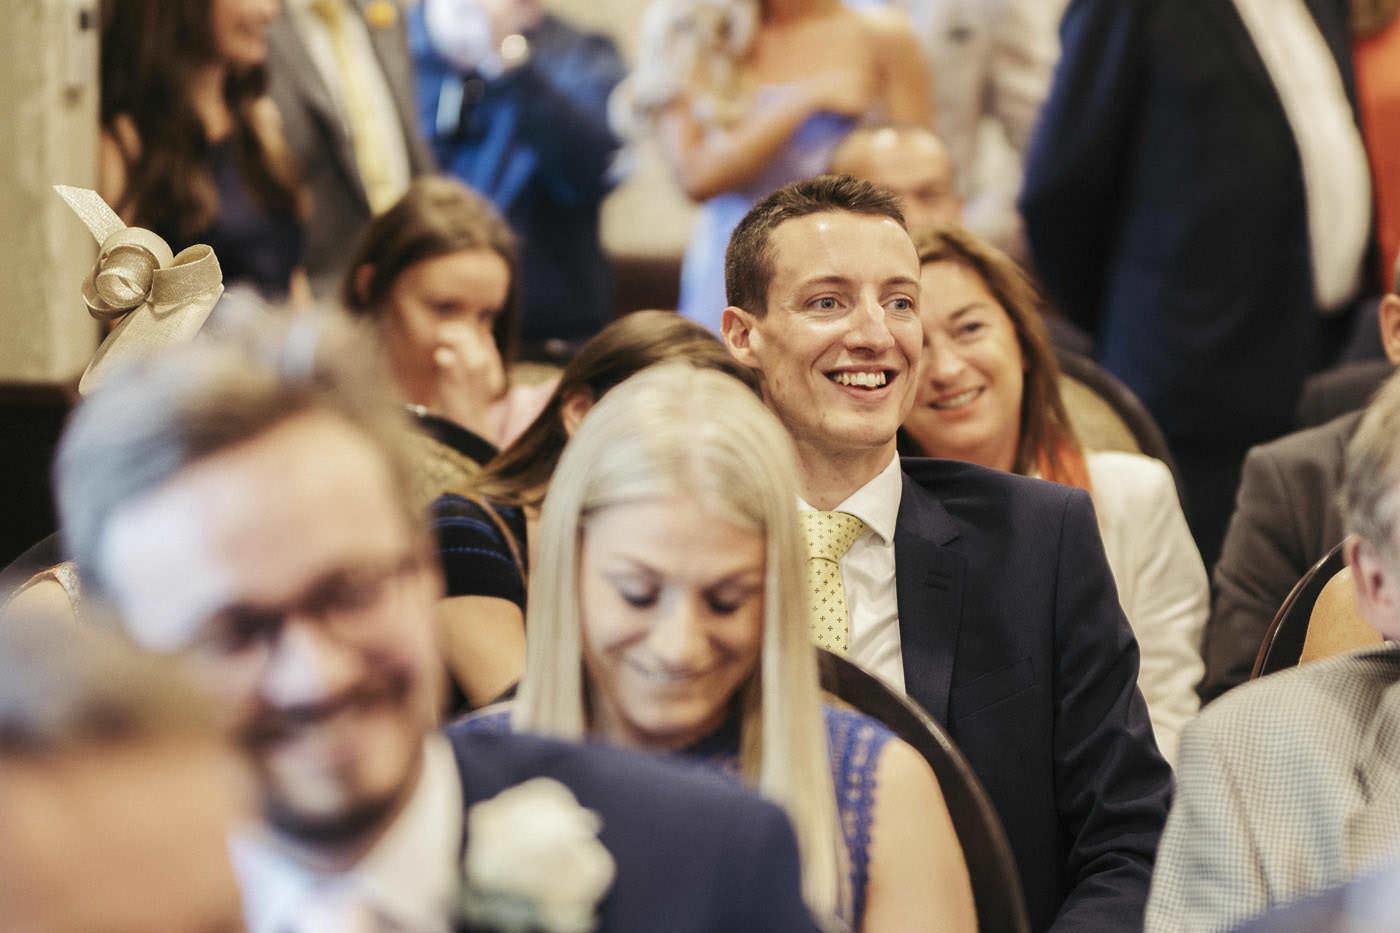 lukeemily foxhills wedding photographer 0051